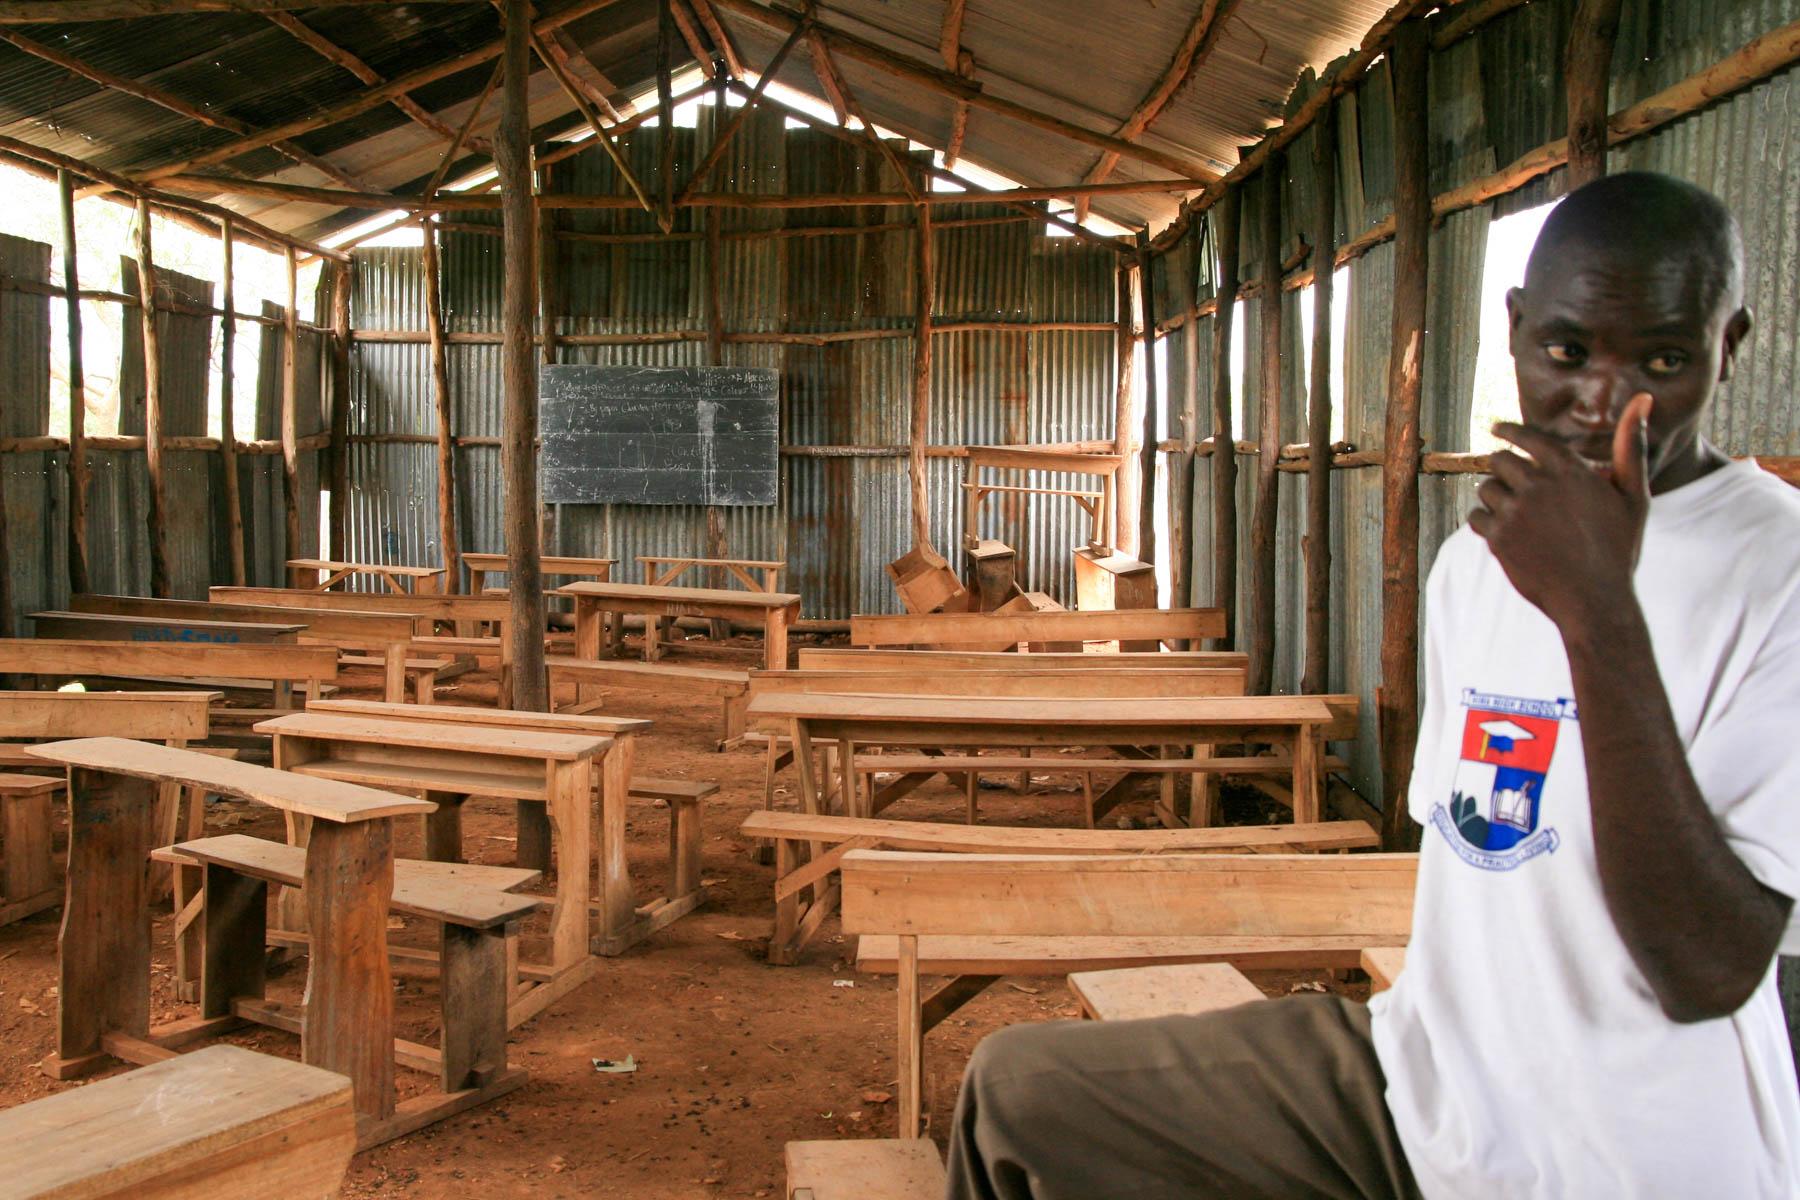 Klassenraum in der Privat-Schule